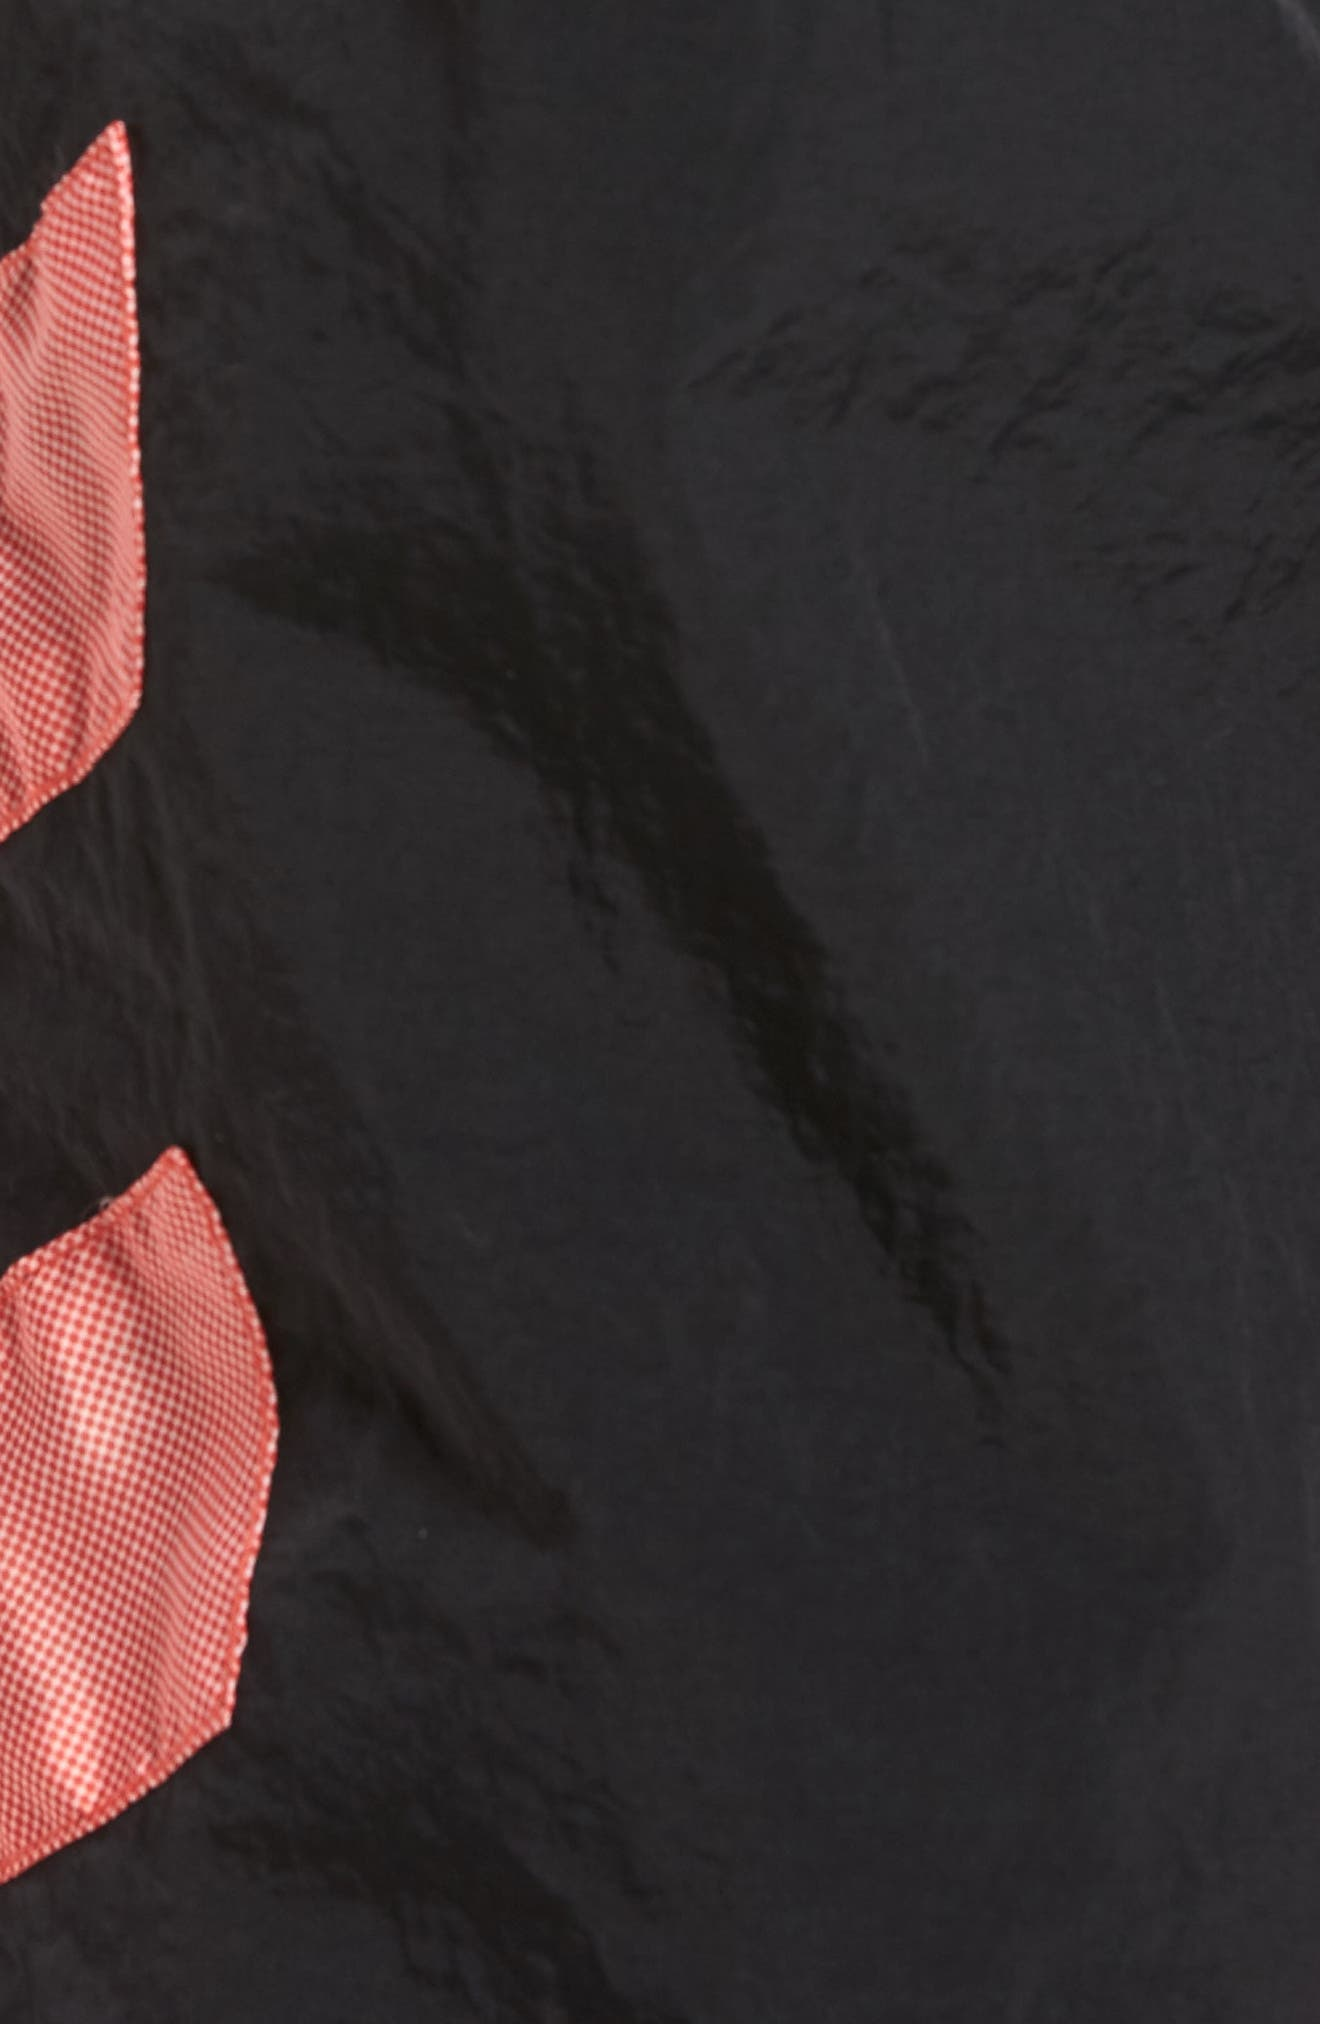 Originals Tironti Windpants,                             Alternate thumbnail 5, color,                             Black/ Grey